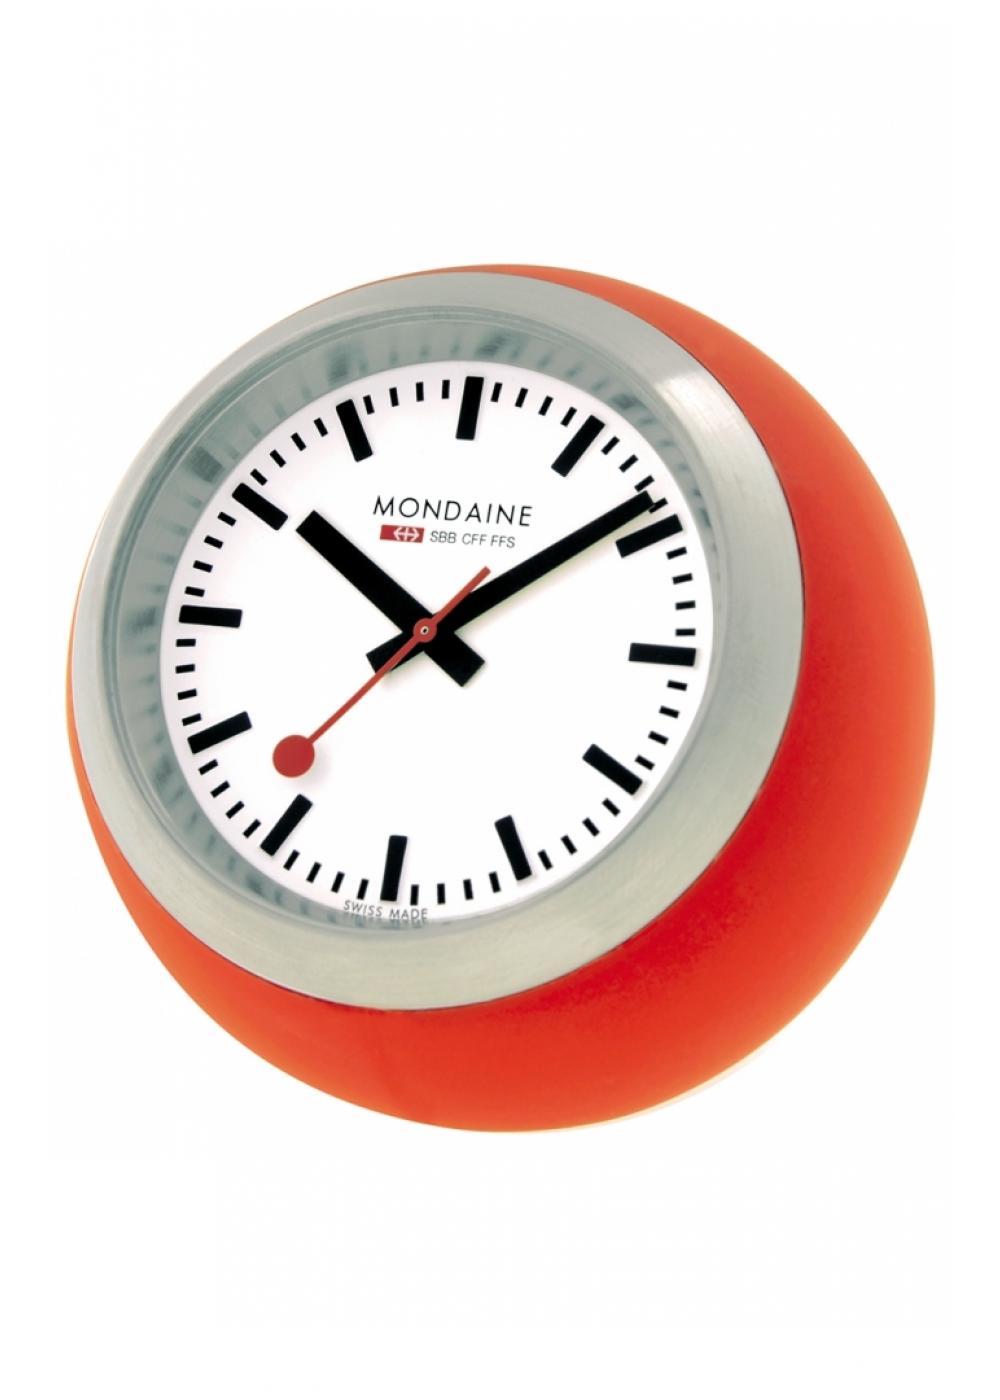 Mondaine desktop clock globe 60mm white dial orange alarm desktop and - Mondaine travel clock ...